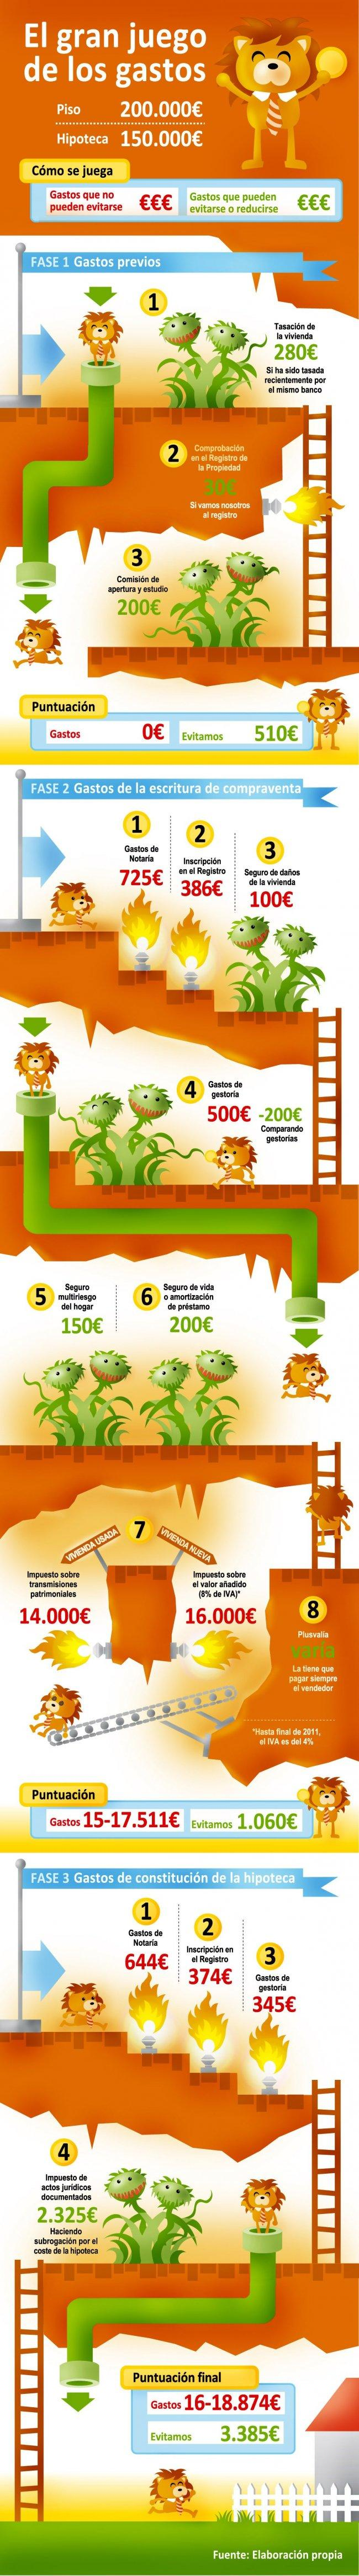 Infografía Videojuego Gastos Hipotecarios